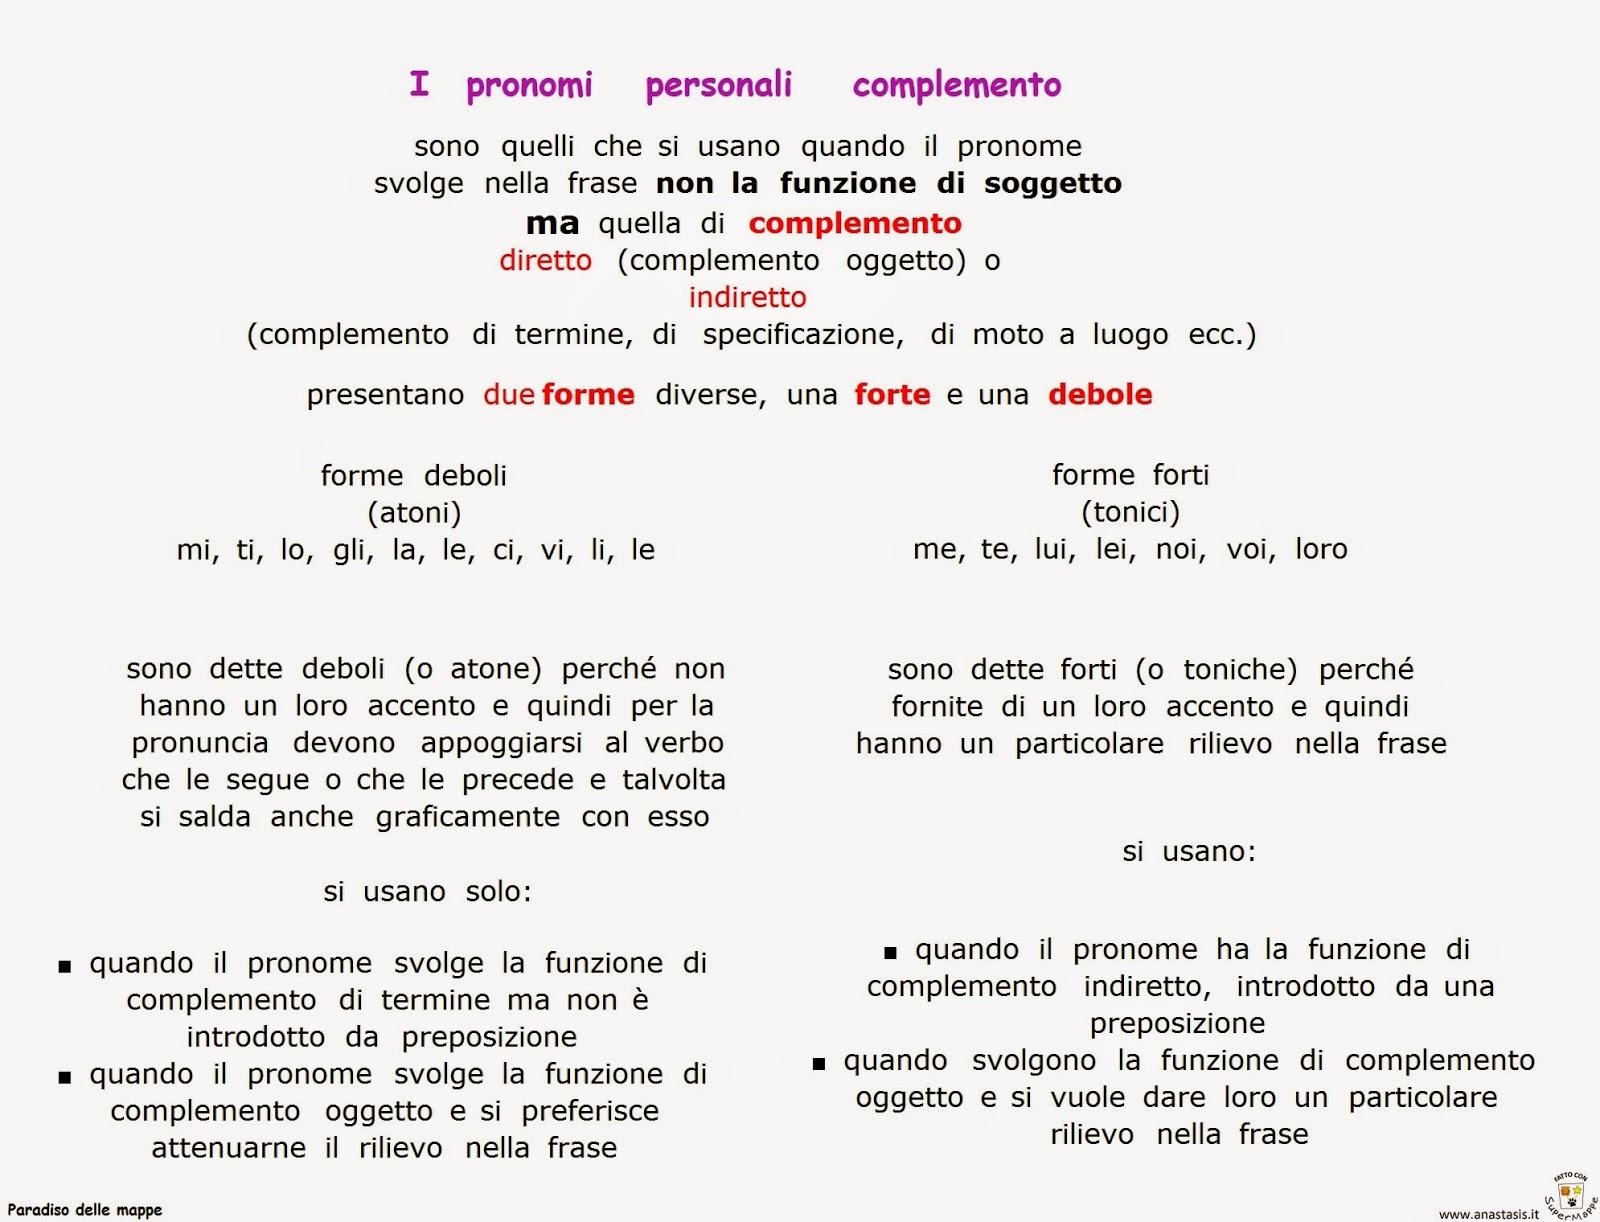 Paradiso delle mappe i pronomi personali complemento for Complemento d arredo in inglese